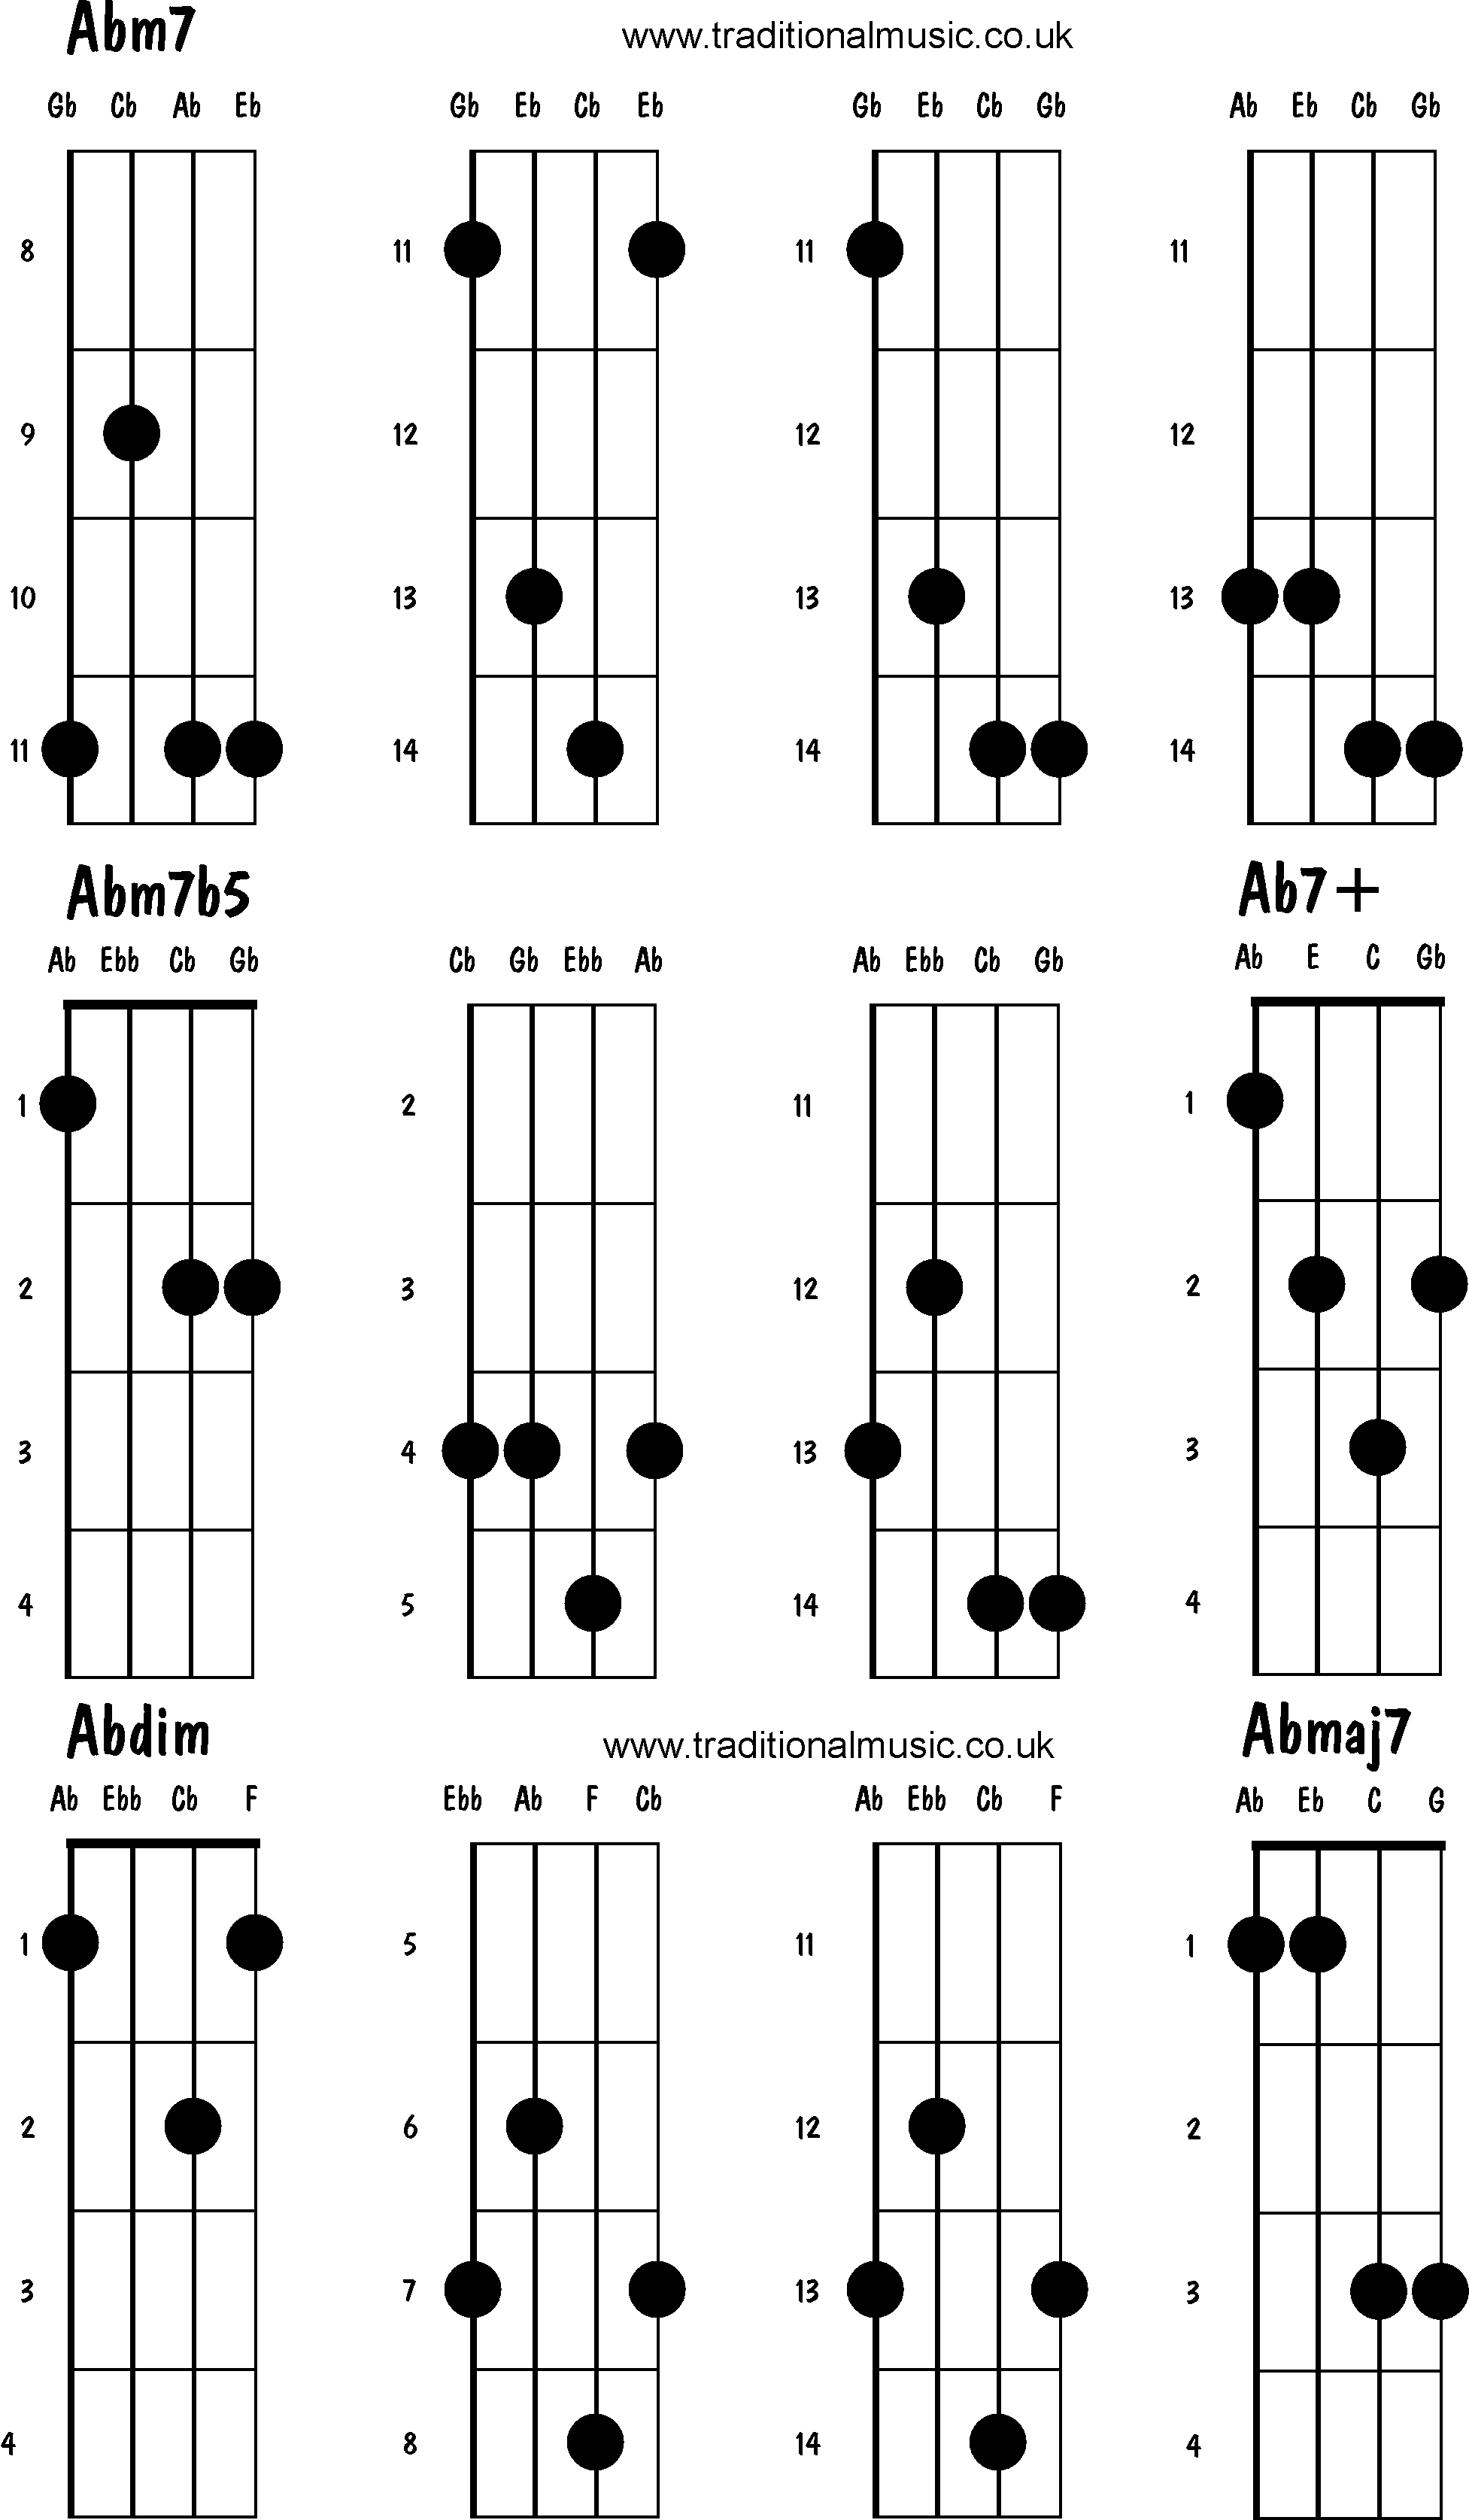 Mandolin Chord Chart Mandolin Chords Advanced Abm7 Ab7b5 Ab7 Abdim Abmaj7